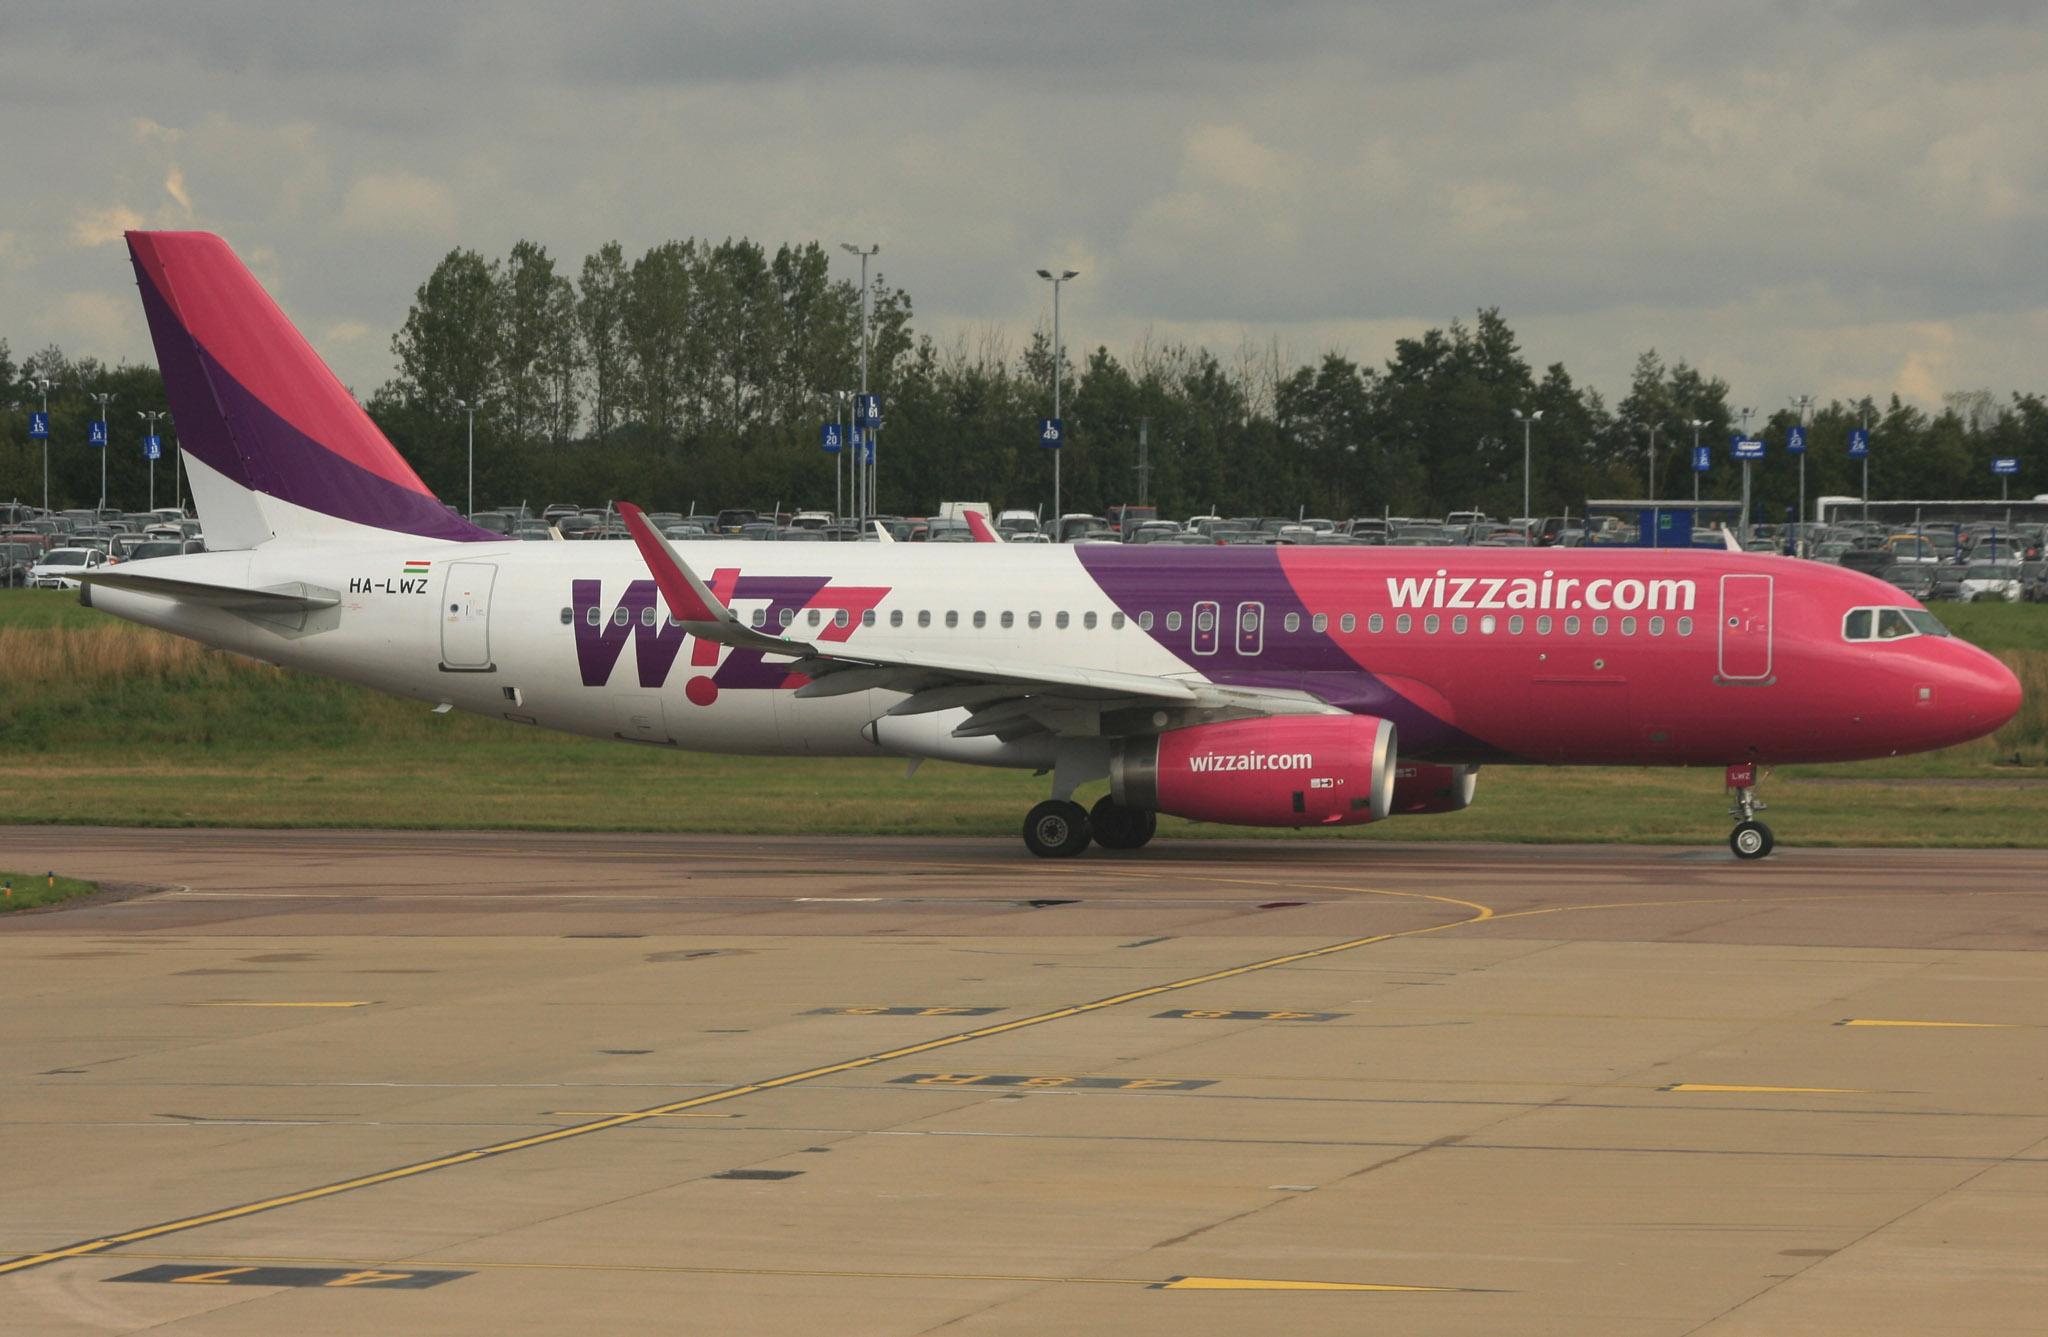 Wizz Air HA-LWZ (IMG5808 JL)